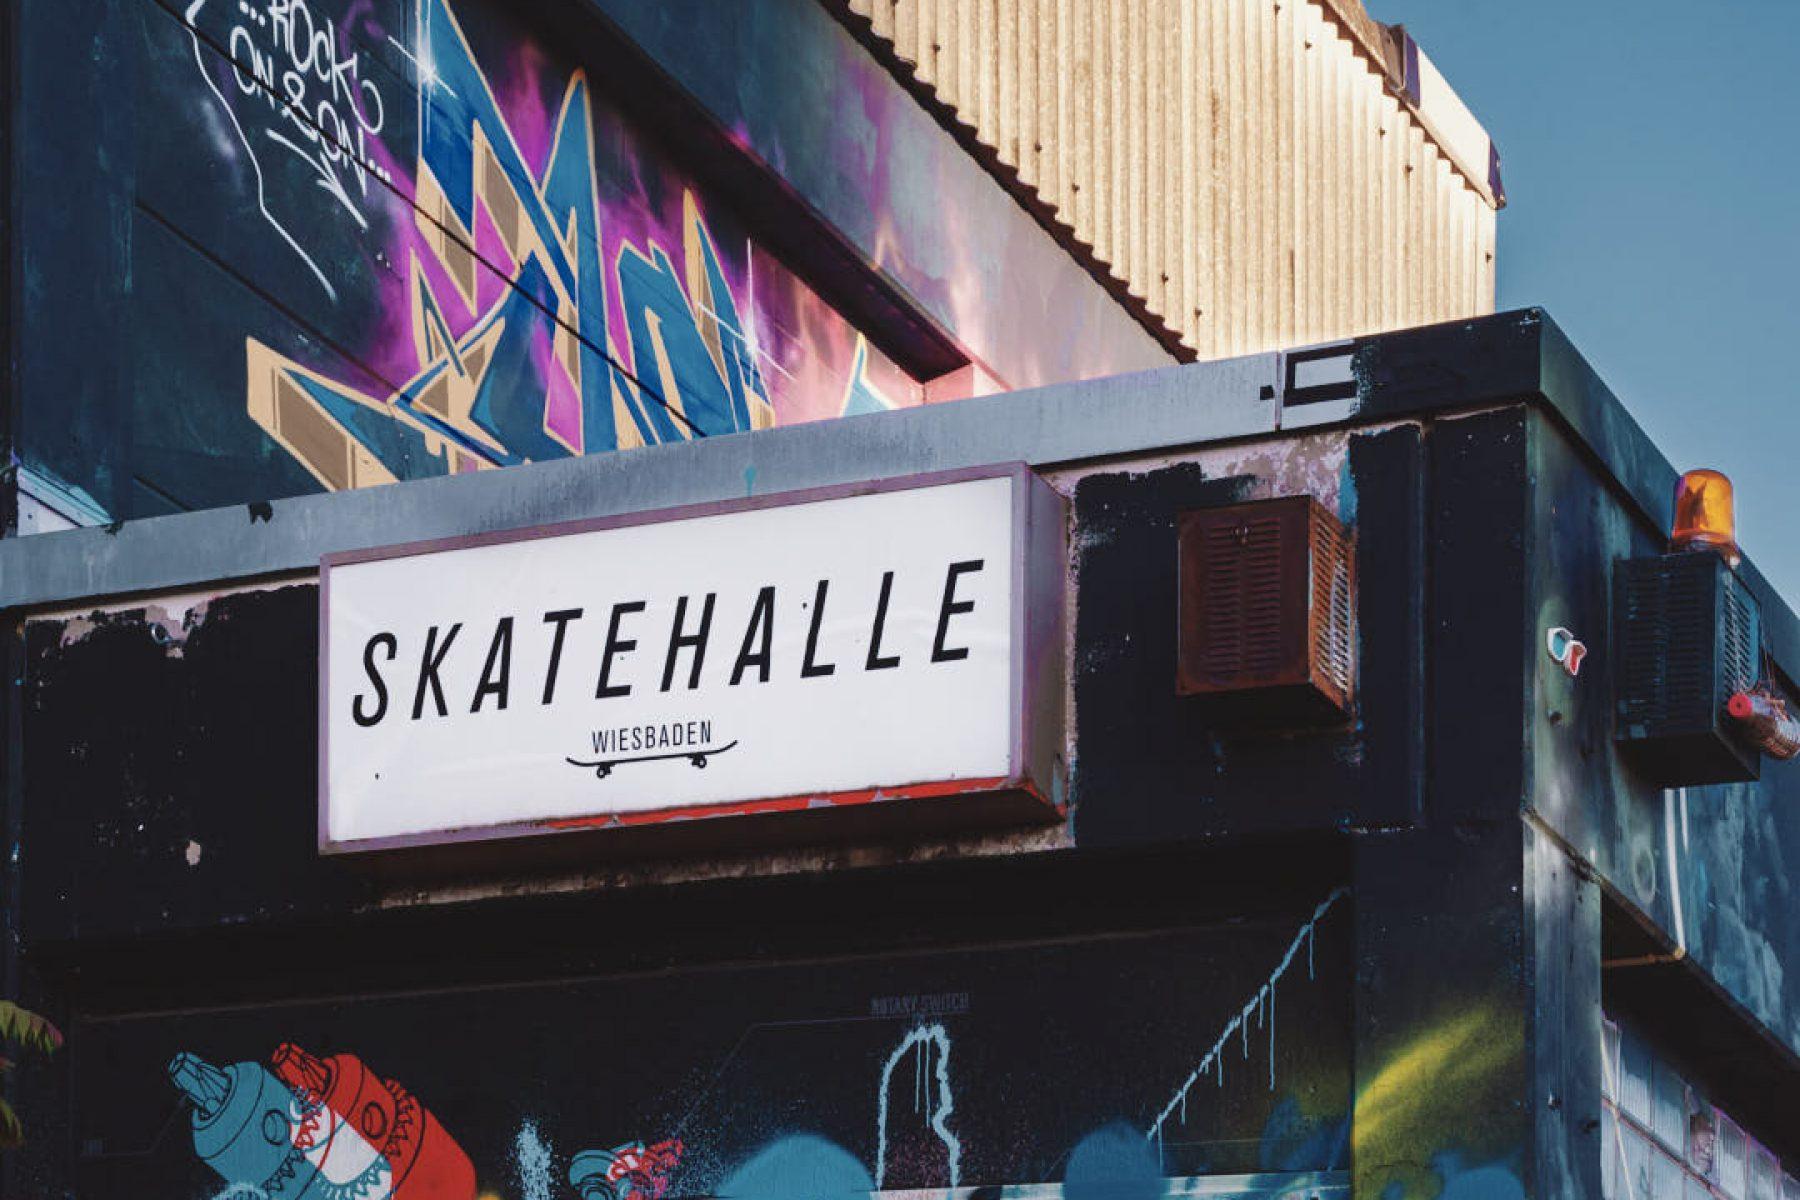 skatehalle wiesbaden